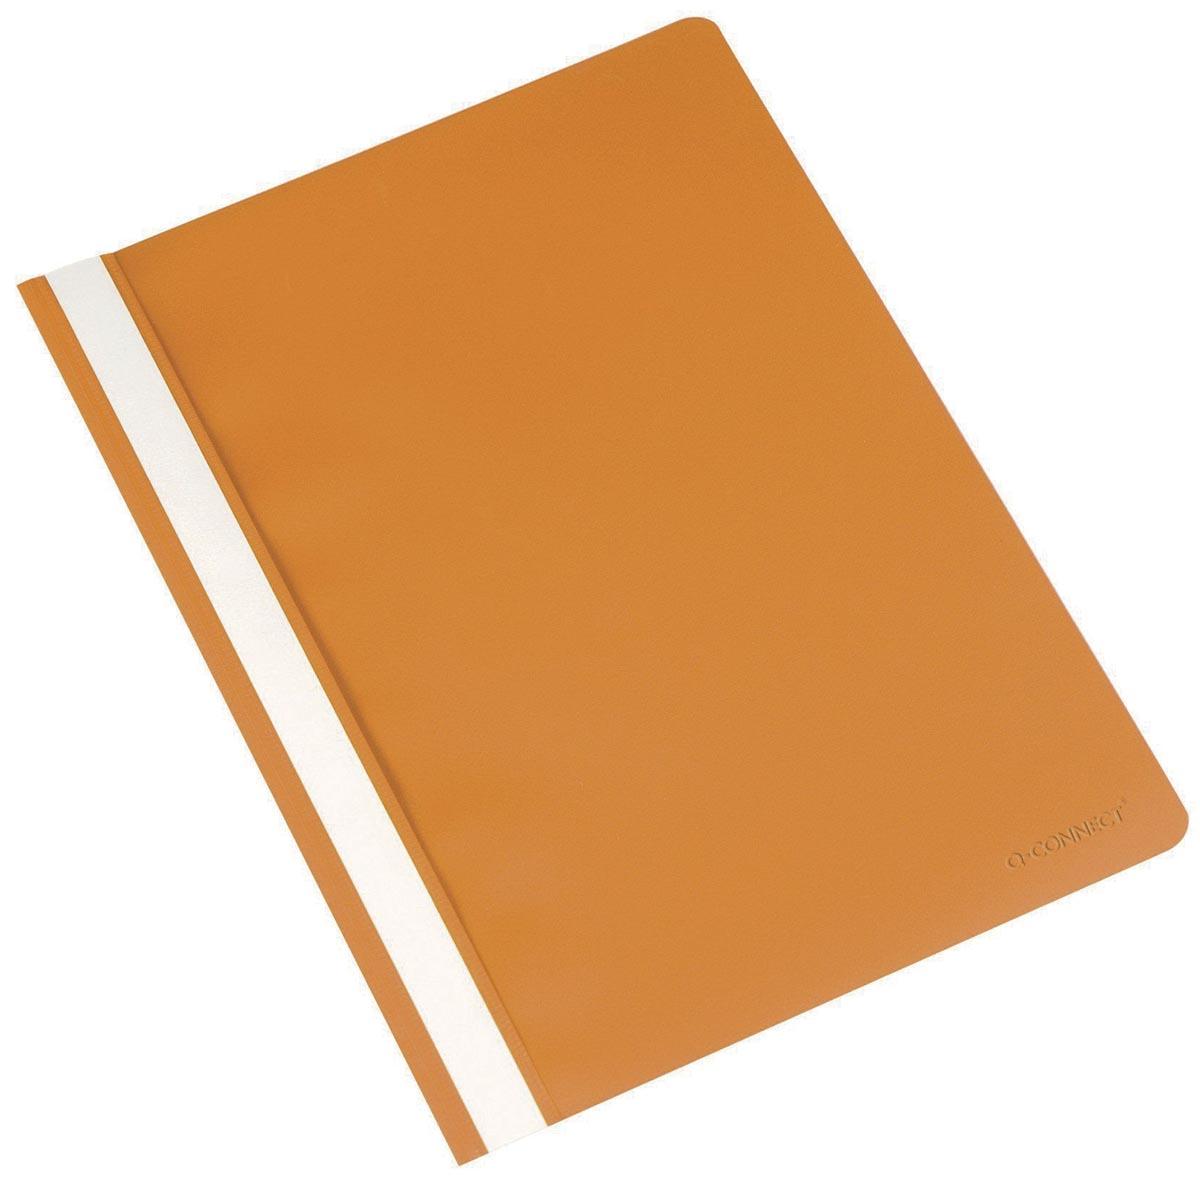 Q-Connect snelhechtmap, oranje